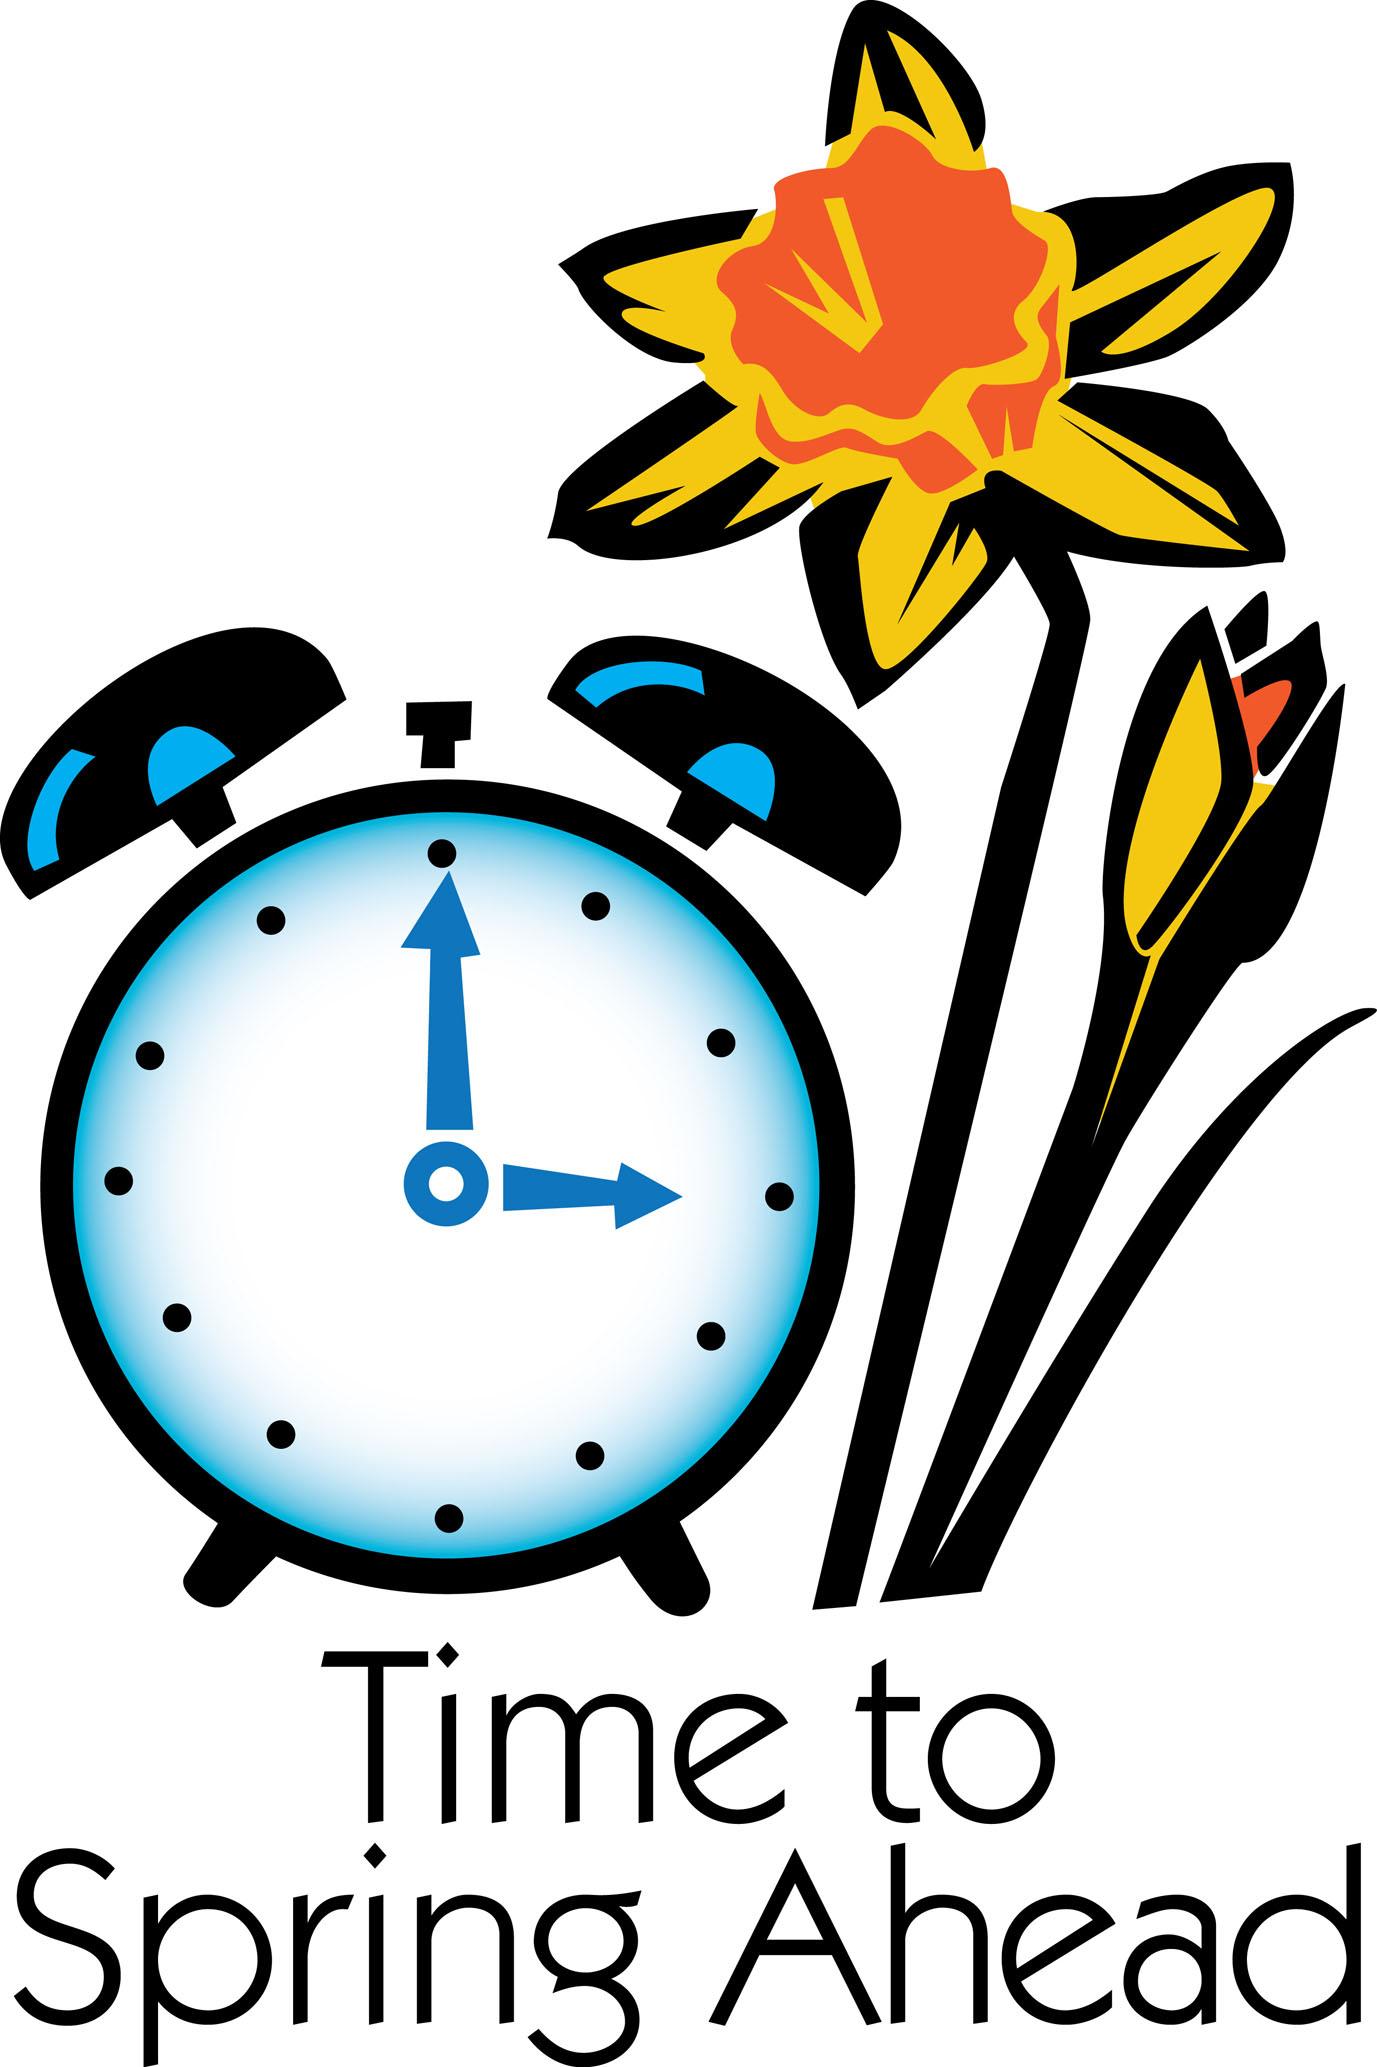 Daylight Savings Time Starts .-Daylight Savings Time Starts .-2